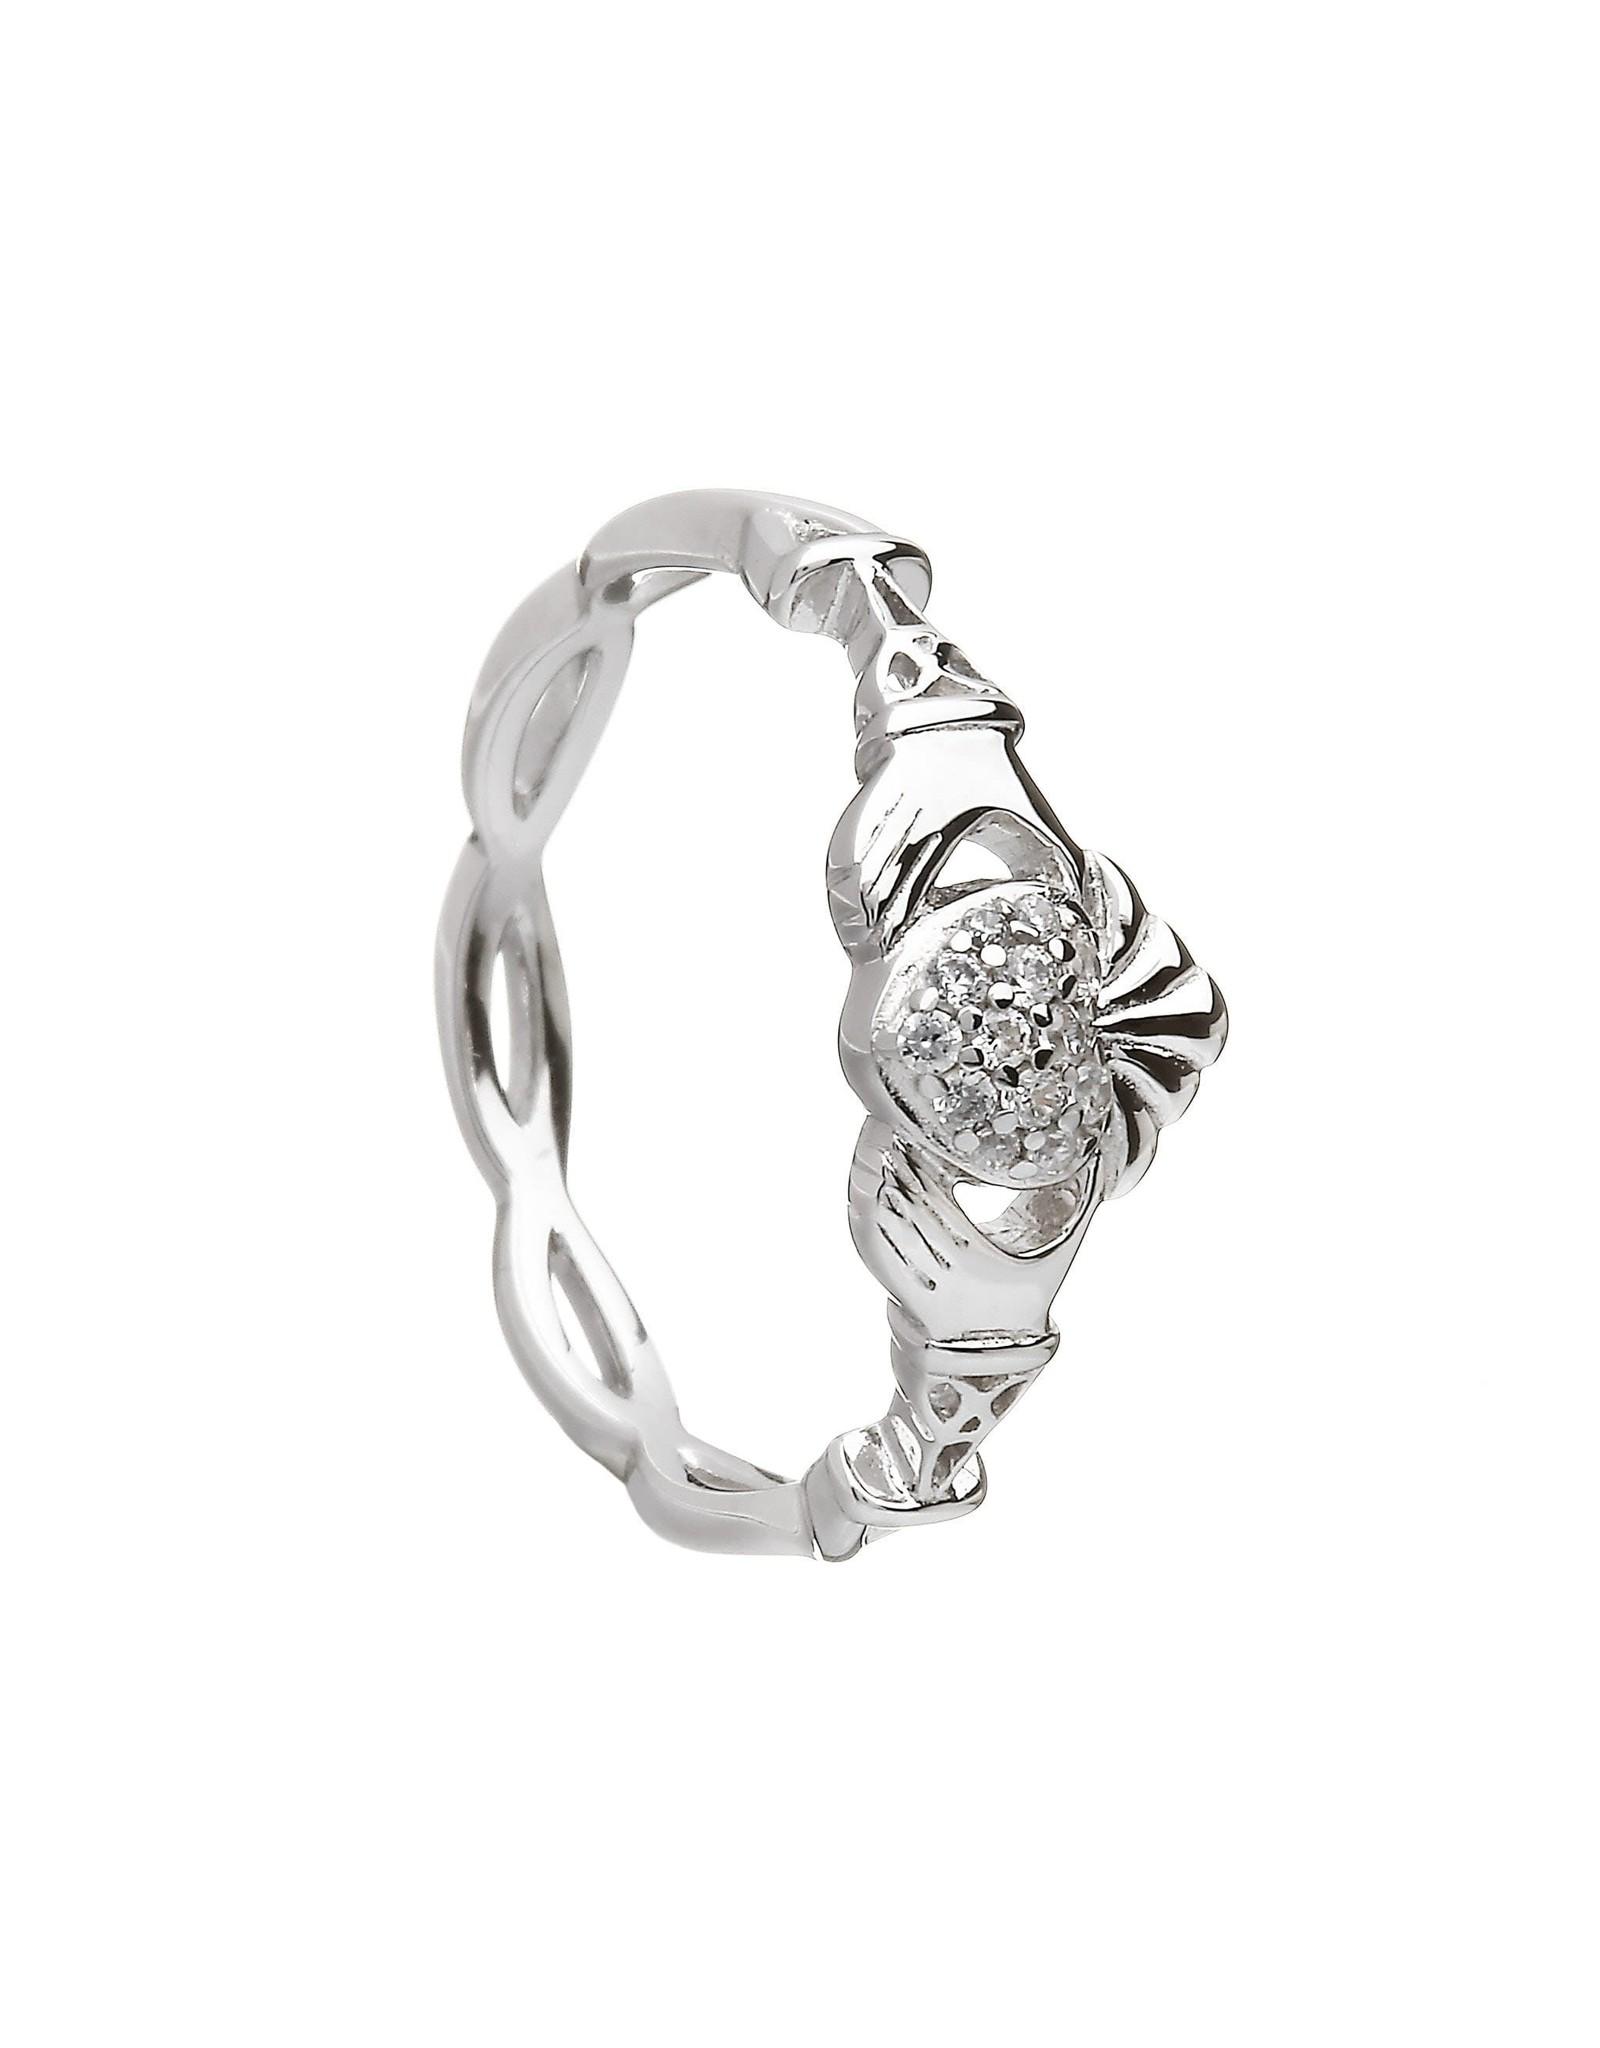 Boru Jewelry Sterling Silver Pave Set Claddagh Ring